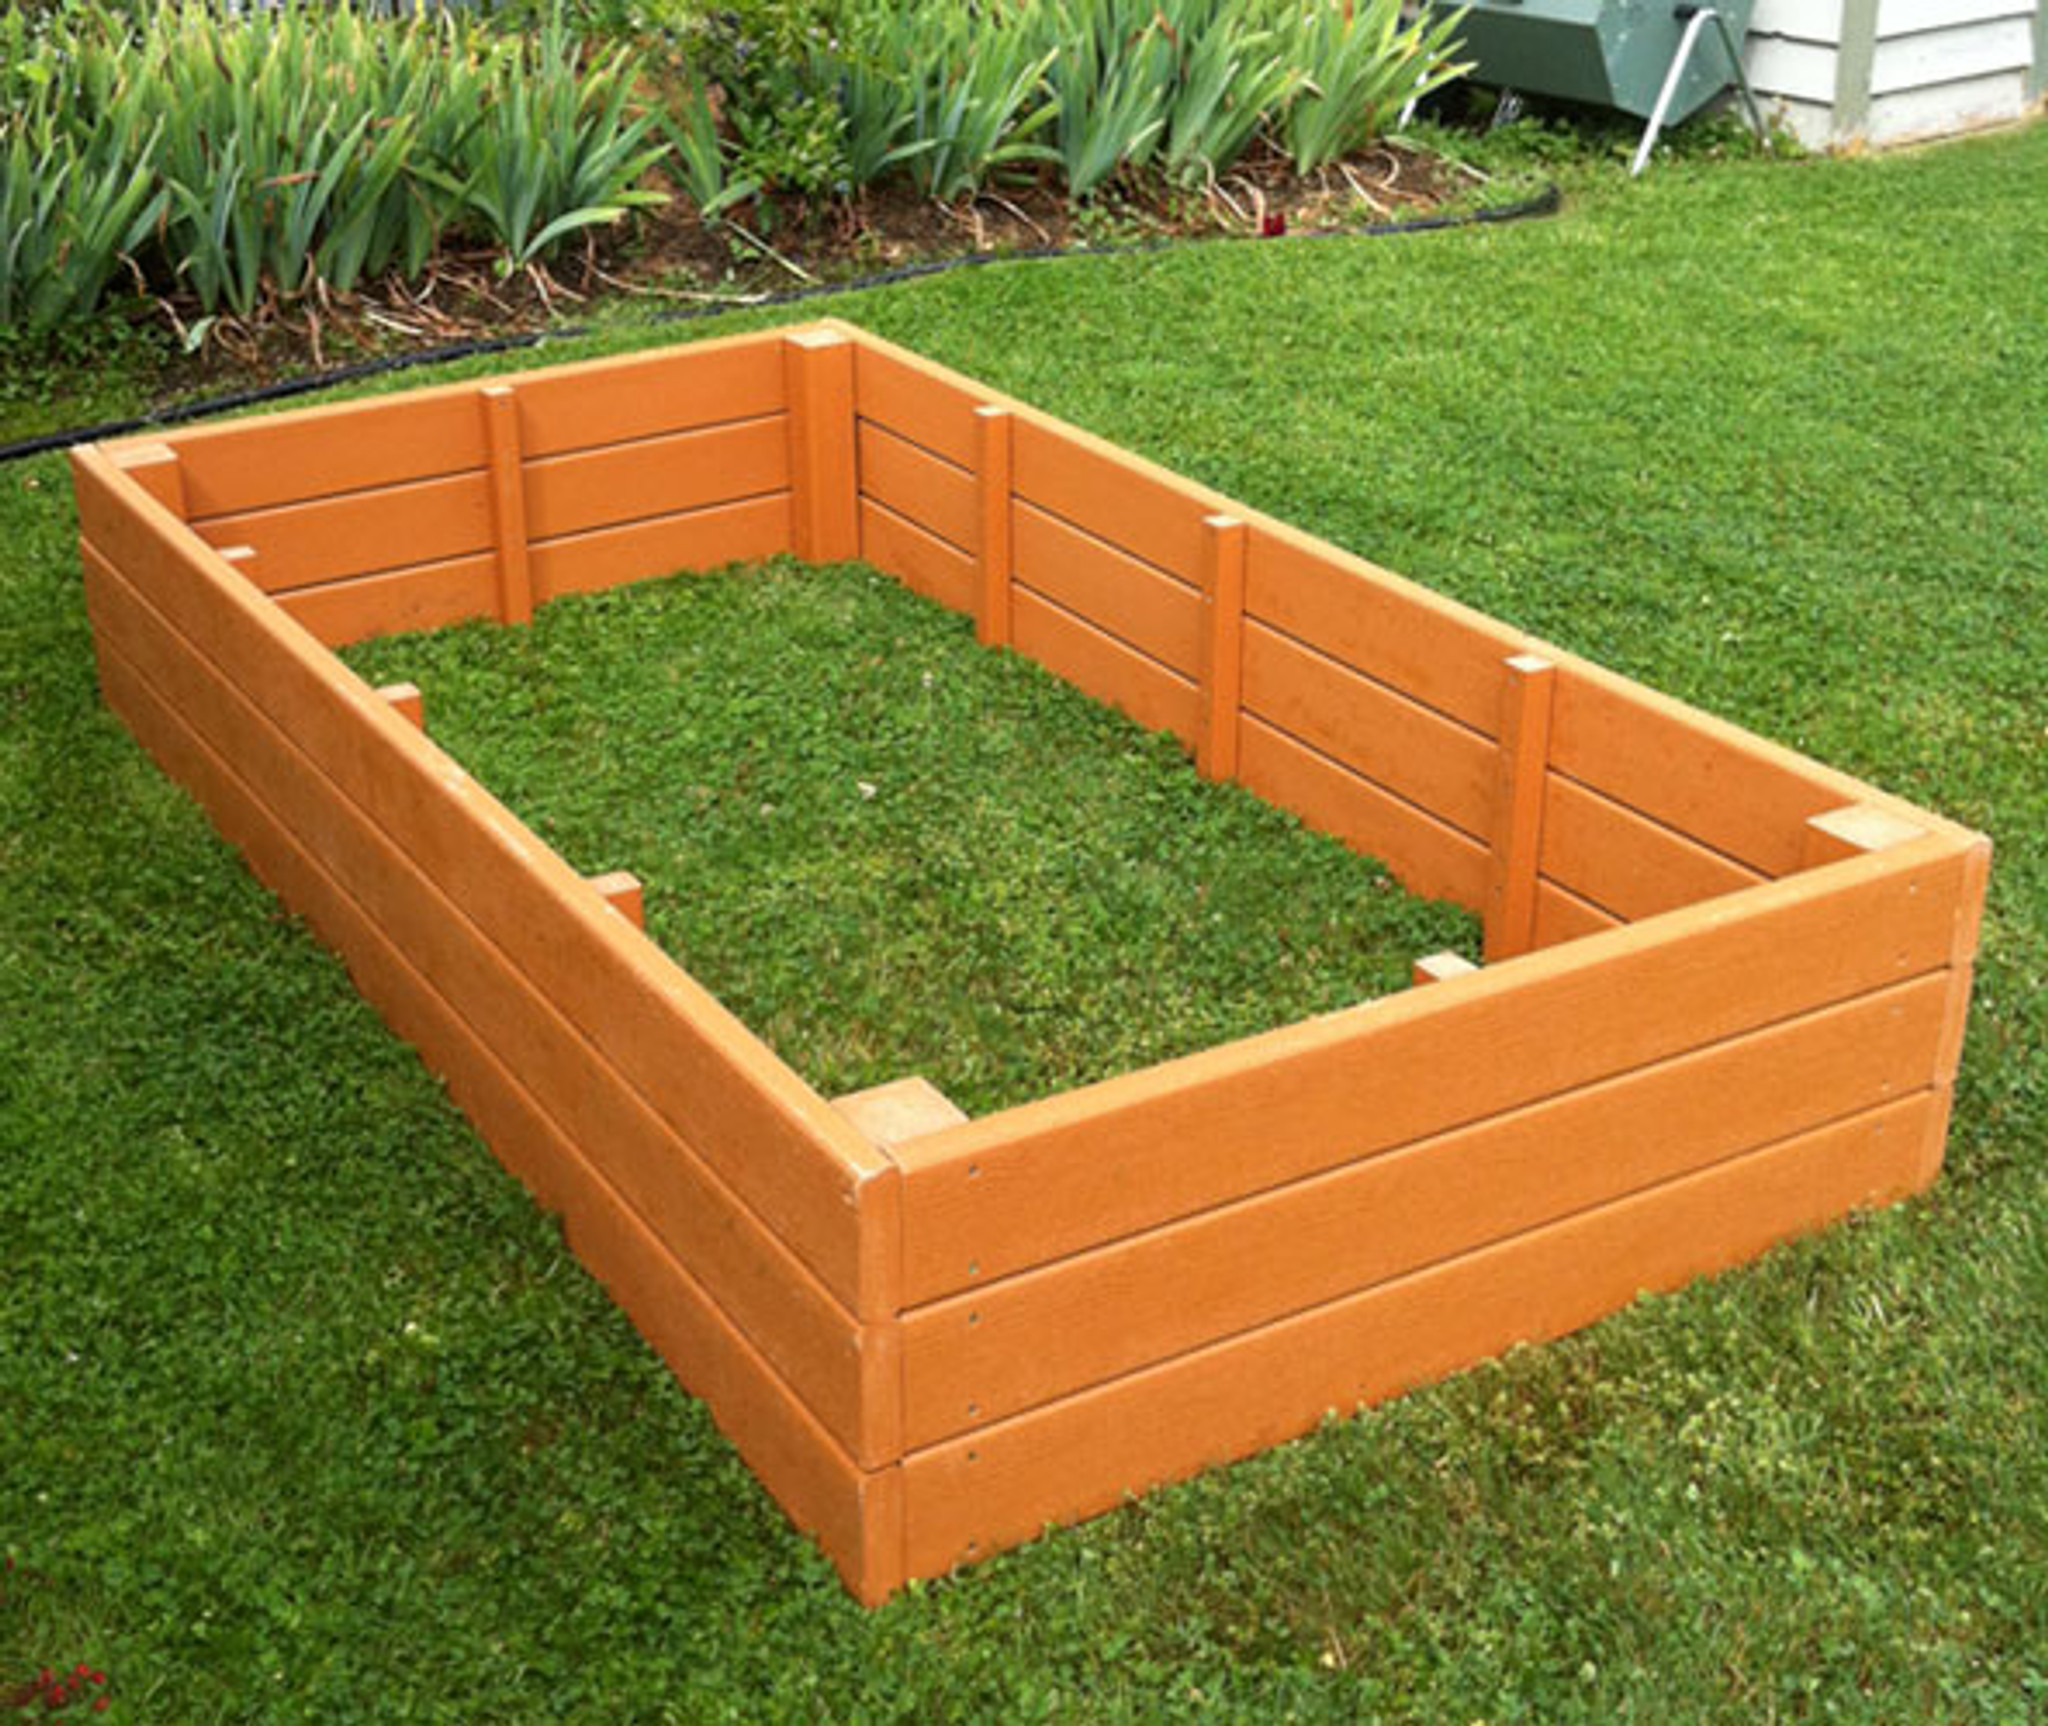 Recycled Plastic Raised Garden Bed 4 X 8 X 11 Eartheasy Com